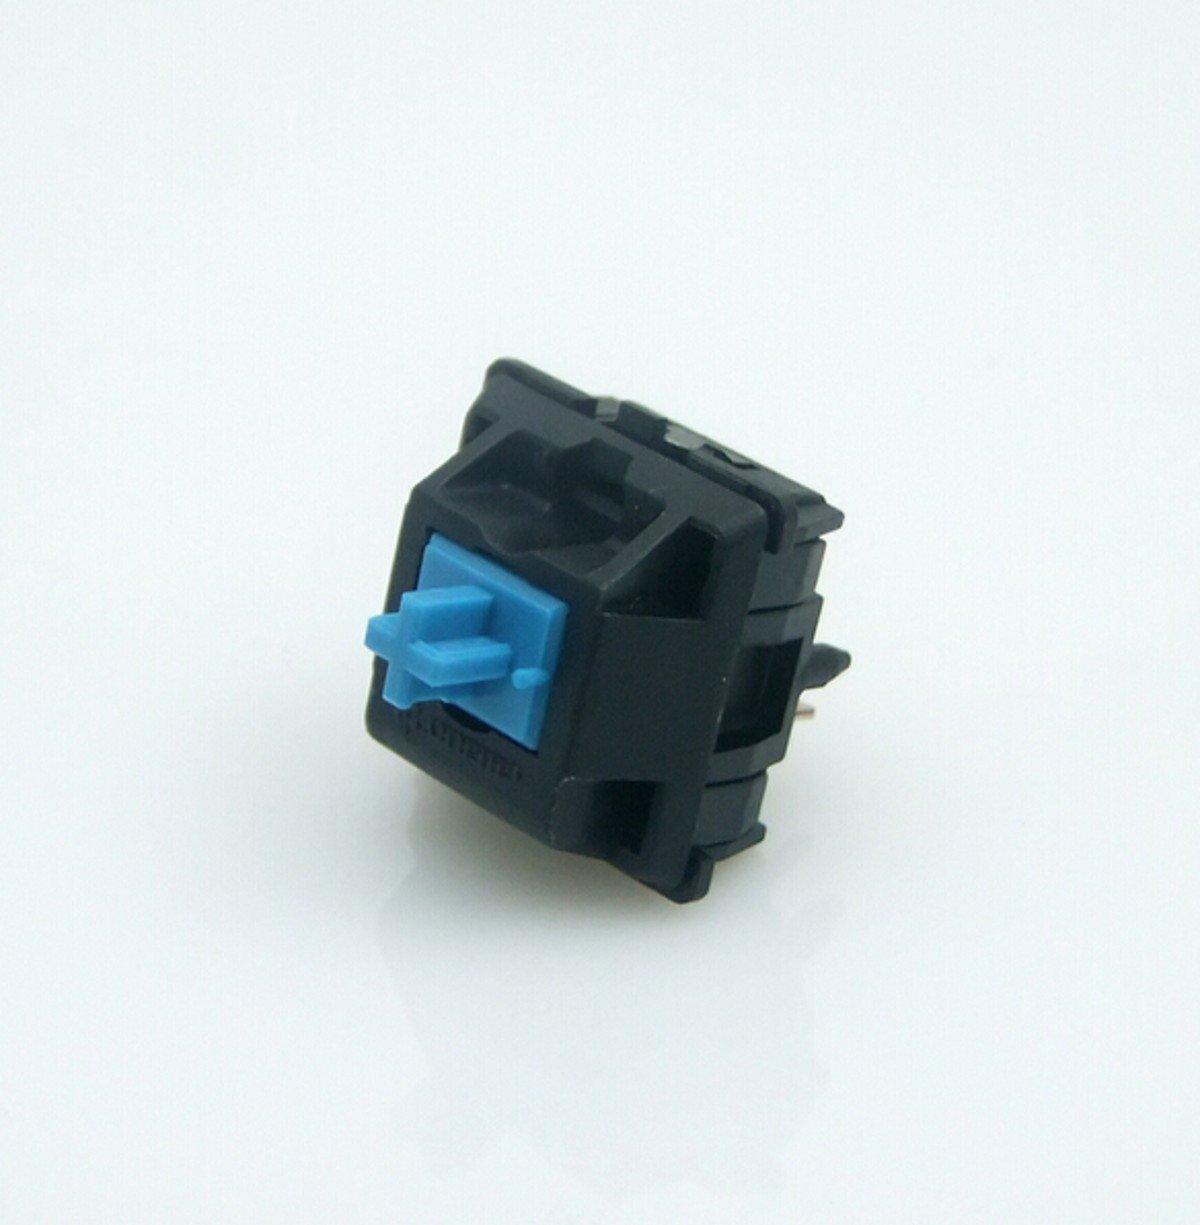 CHENGYIDA 10PCS CHERRY MX Series Keyswitches Blue(Cyan) - Keyboards Switches GENUINE Replacement-ORIGINAL KEYBOARD SWITCH Ltd